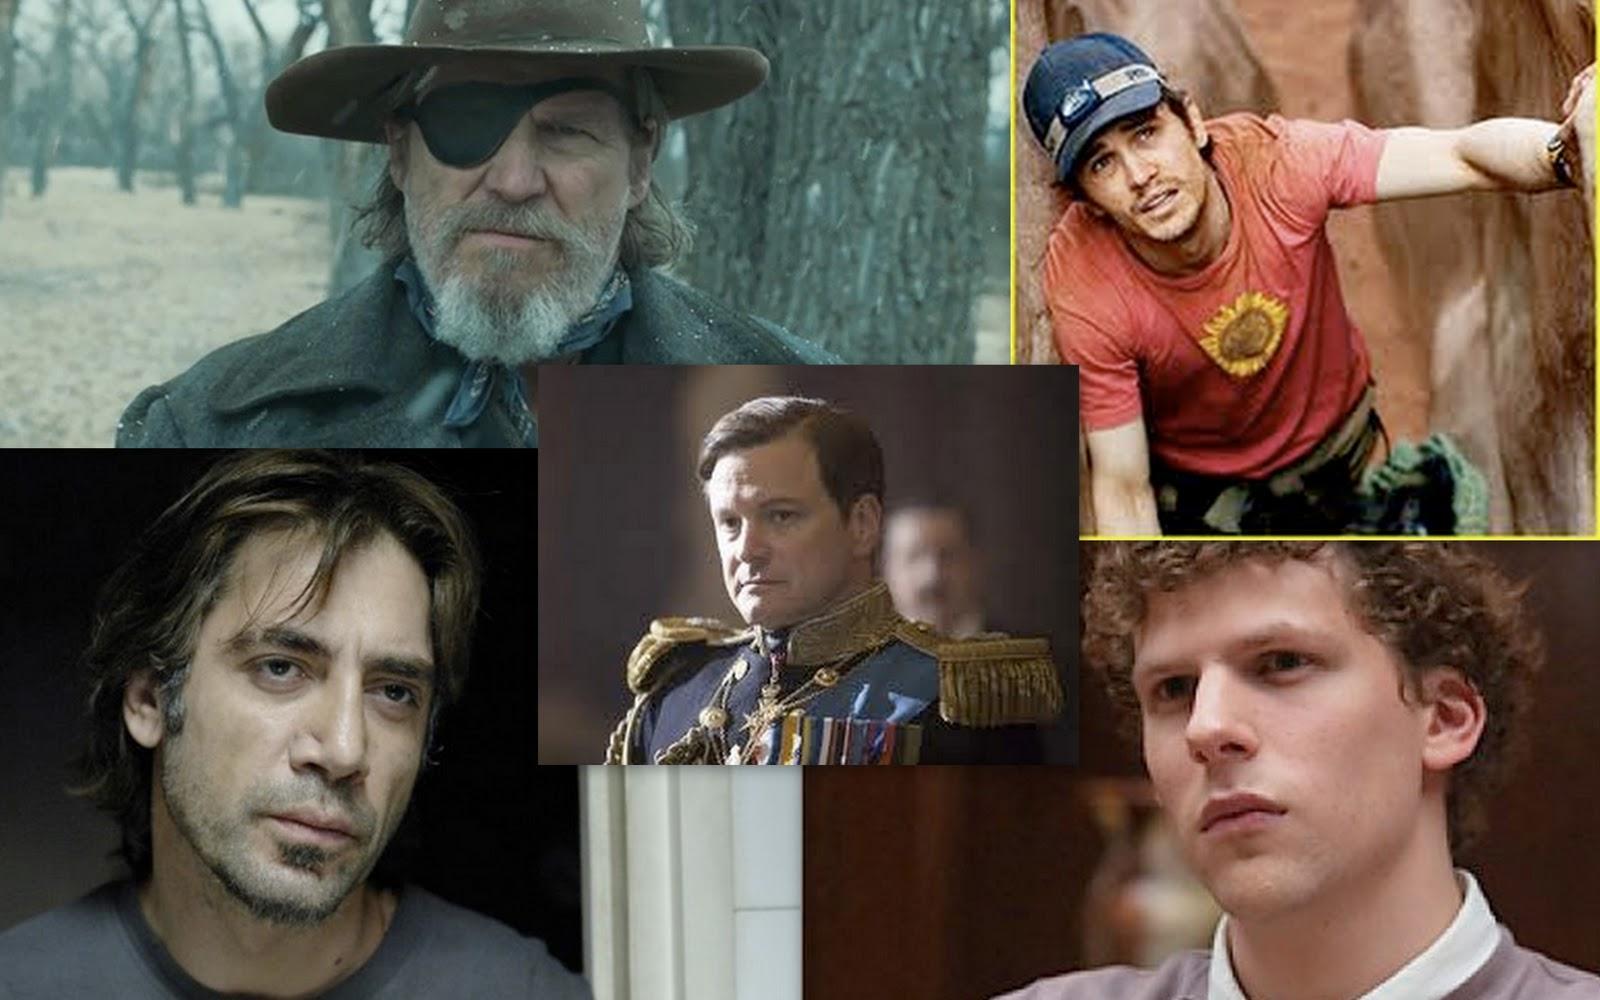 http://4.bp.blogspot.com/_TJM9phim3hk/TVIJ-hHBNxI/AAAAAAAAAFk/AFZffyXjRnk/s1600/Best+Actor.jpg